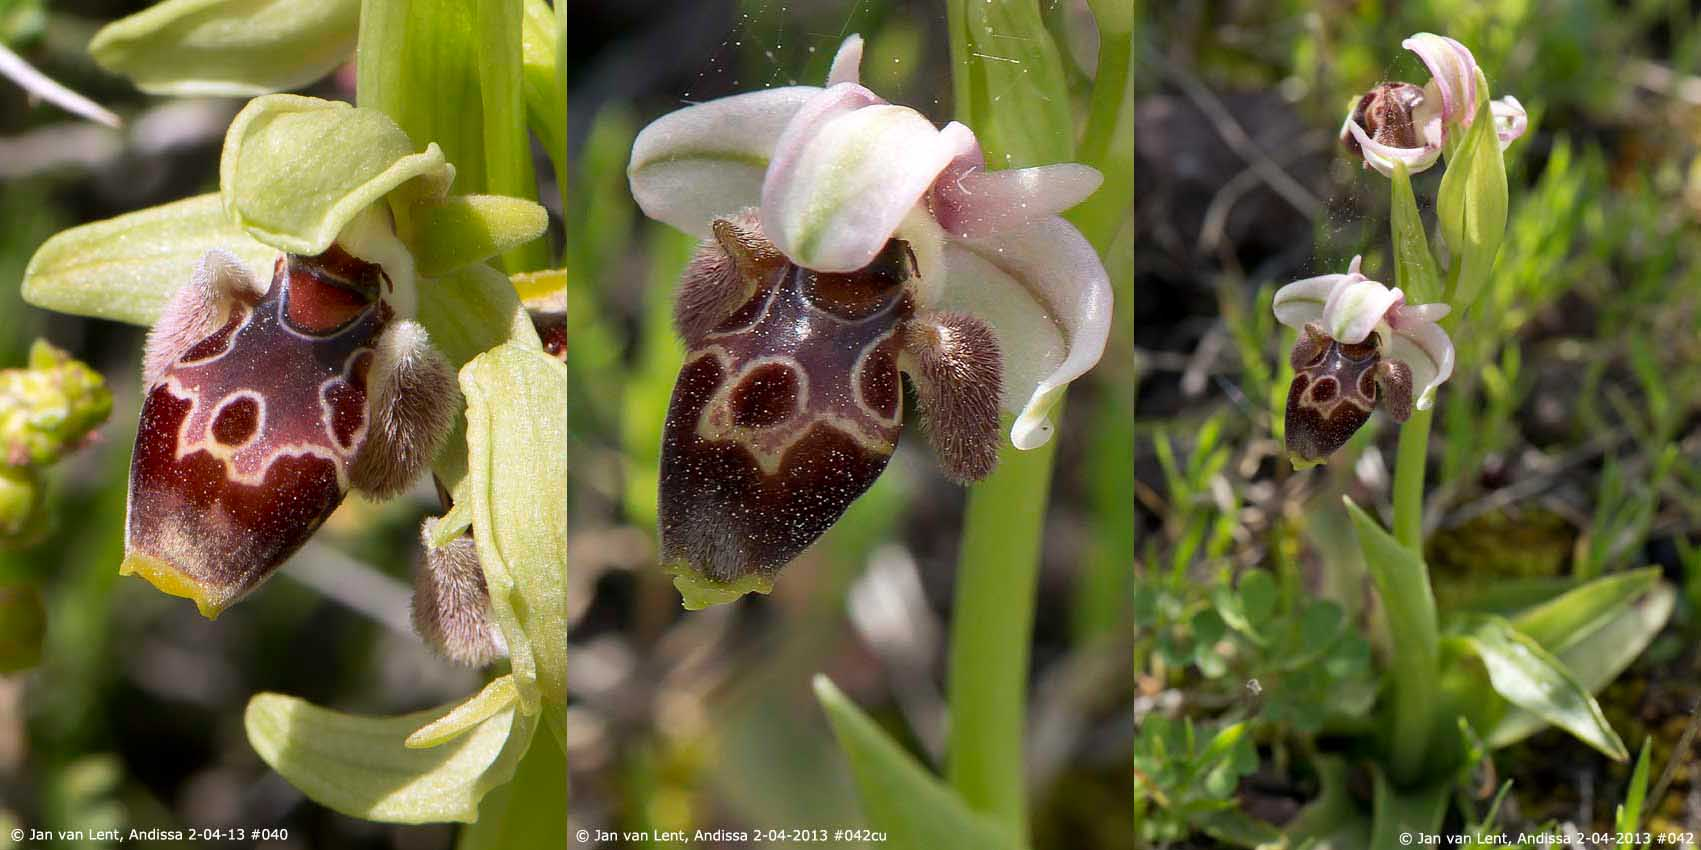 Ophrys bucephala, Andissa © Jan van Lent 2-04-2013 #040 #042cu, #042